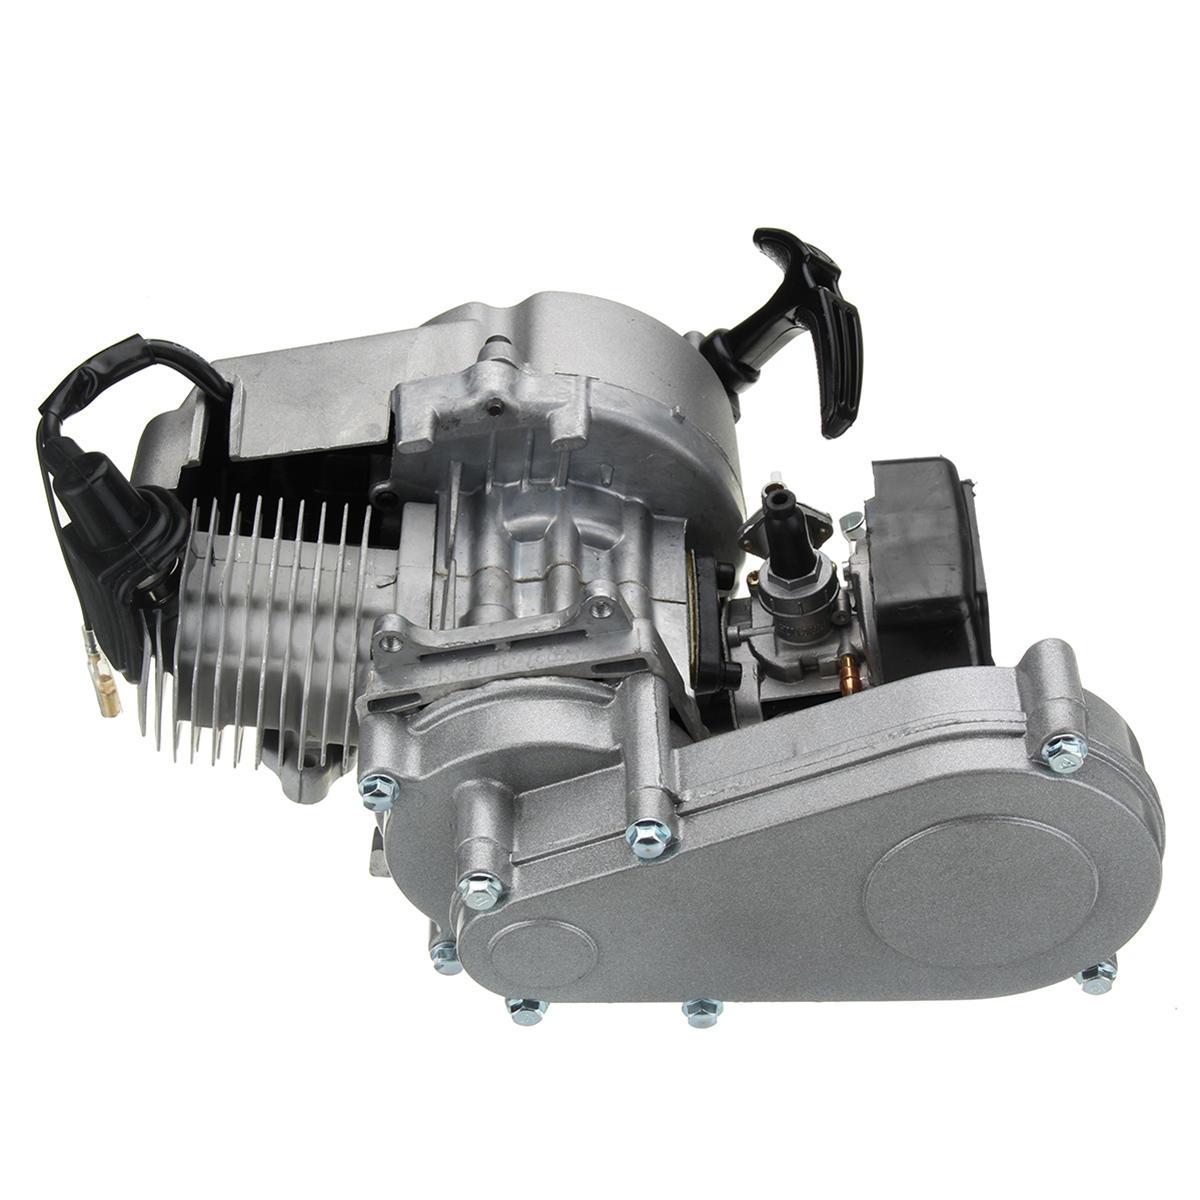 49cc Engine 2-Stroke Pull Start with Transmission For Mini Motor Pit Dirt Bike